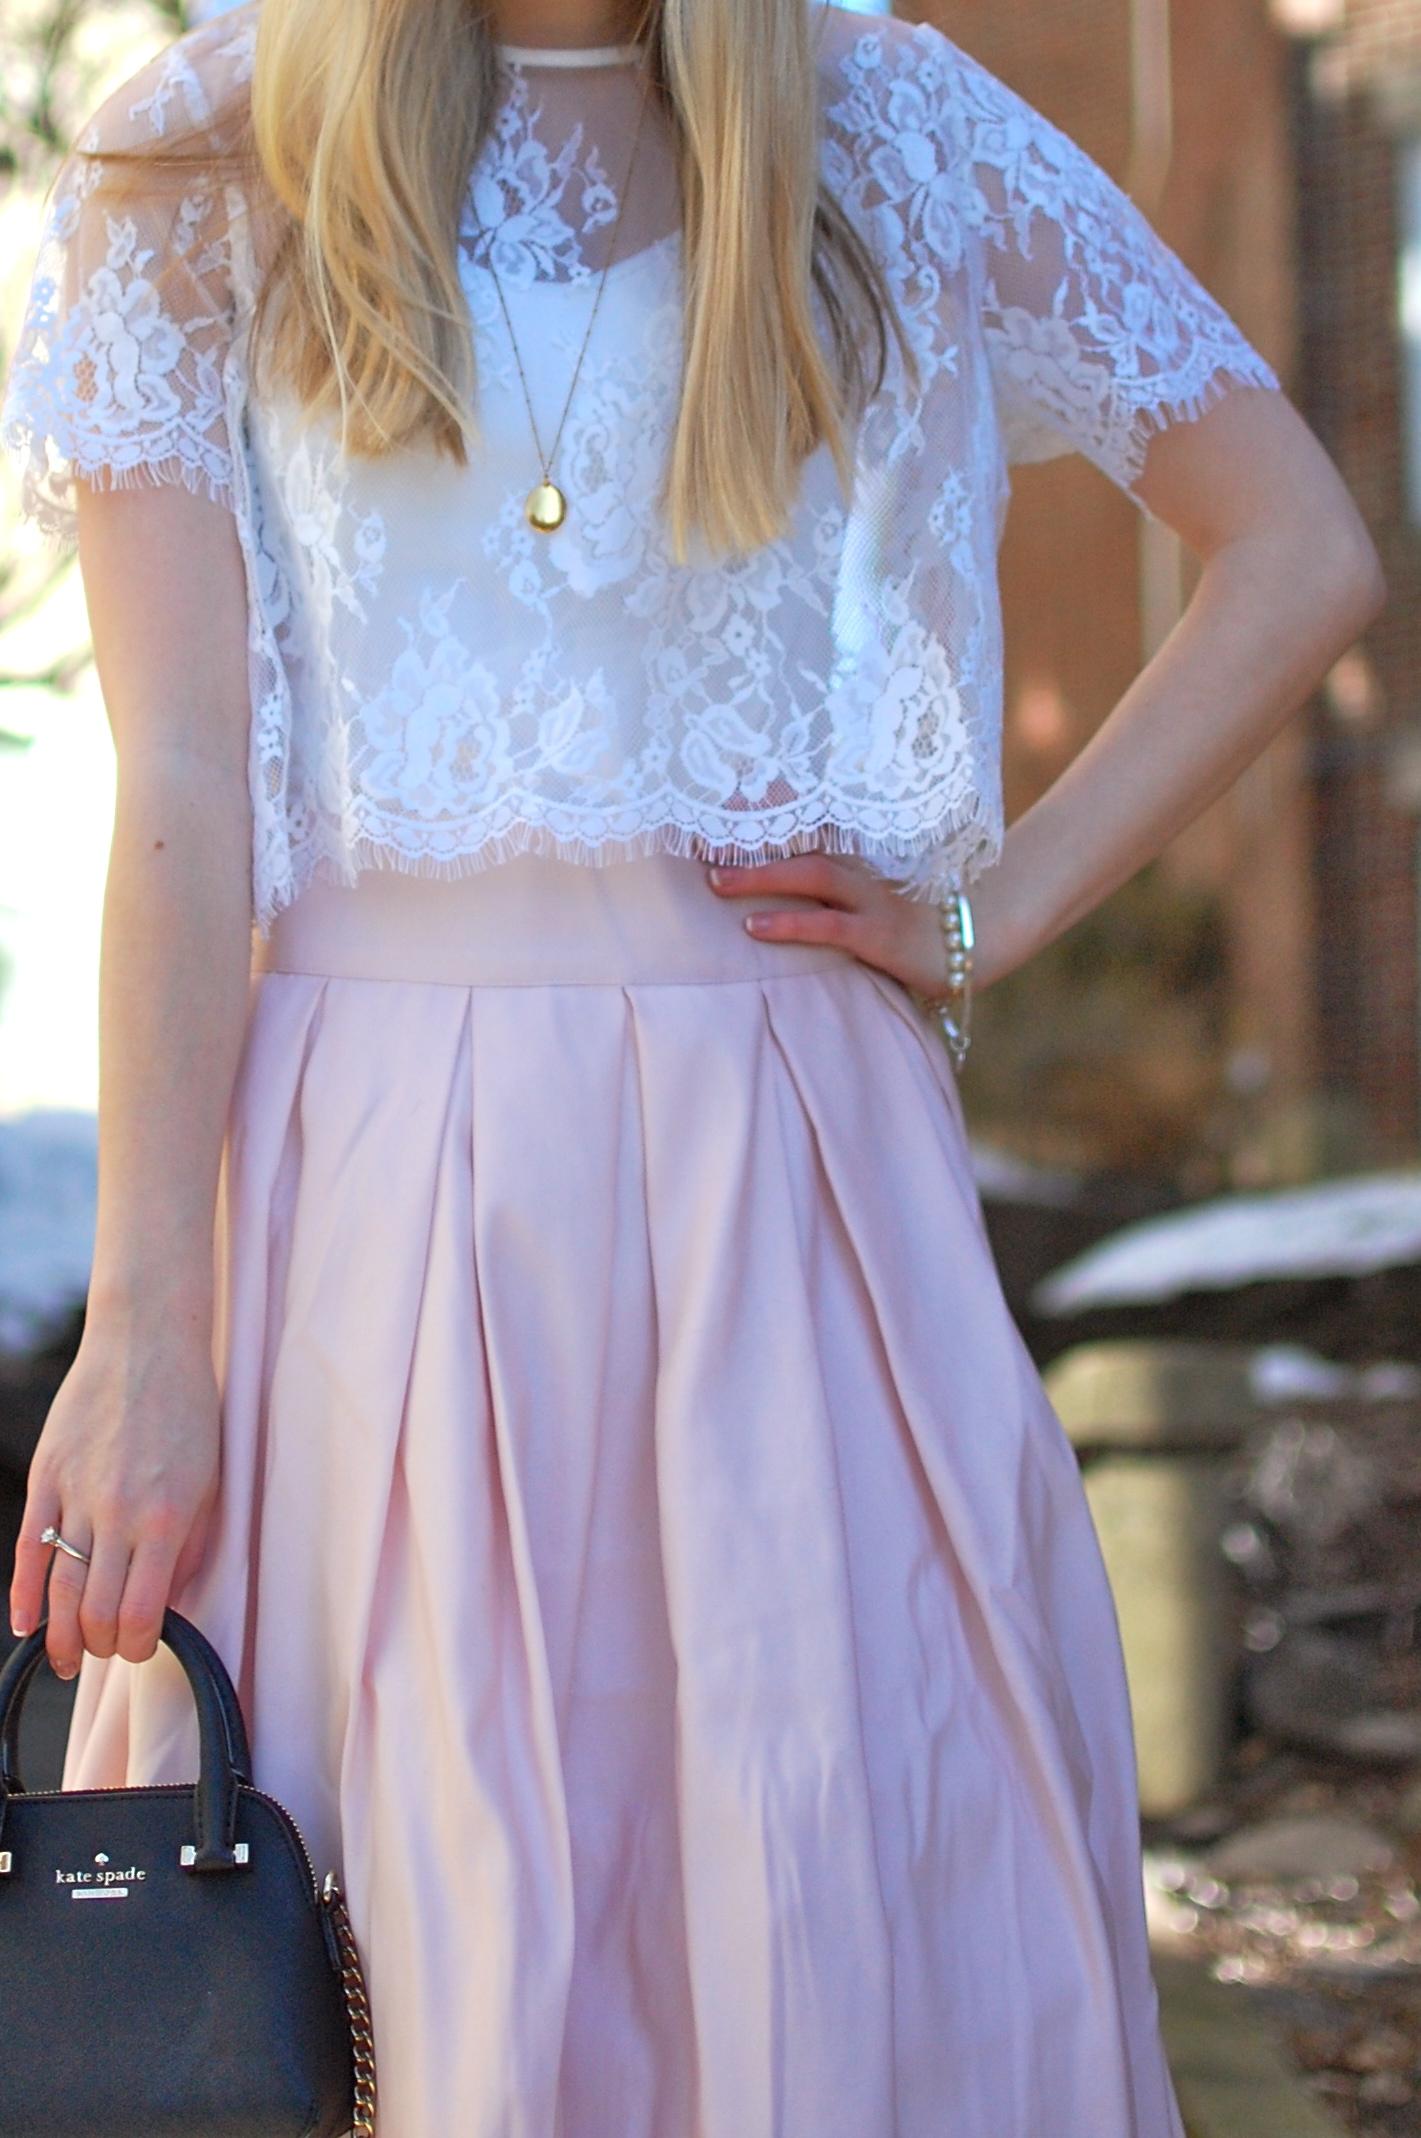 98149e57b9 ... Pink Midi SkirtKate Spade Cedar Street Mini Maisecan you wear a skirt  to a weddingRocksbox coupon codeBlack LC Lauren Conrad Heelsemilysignature